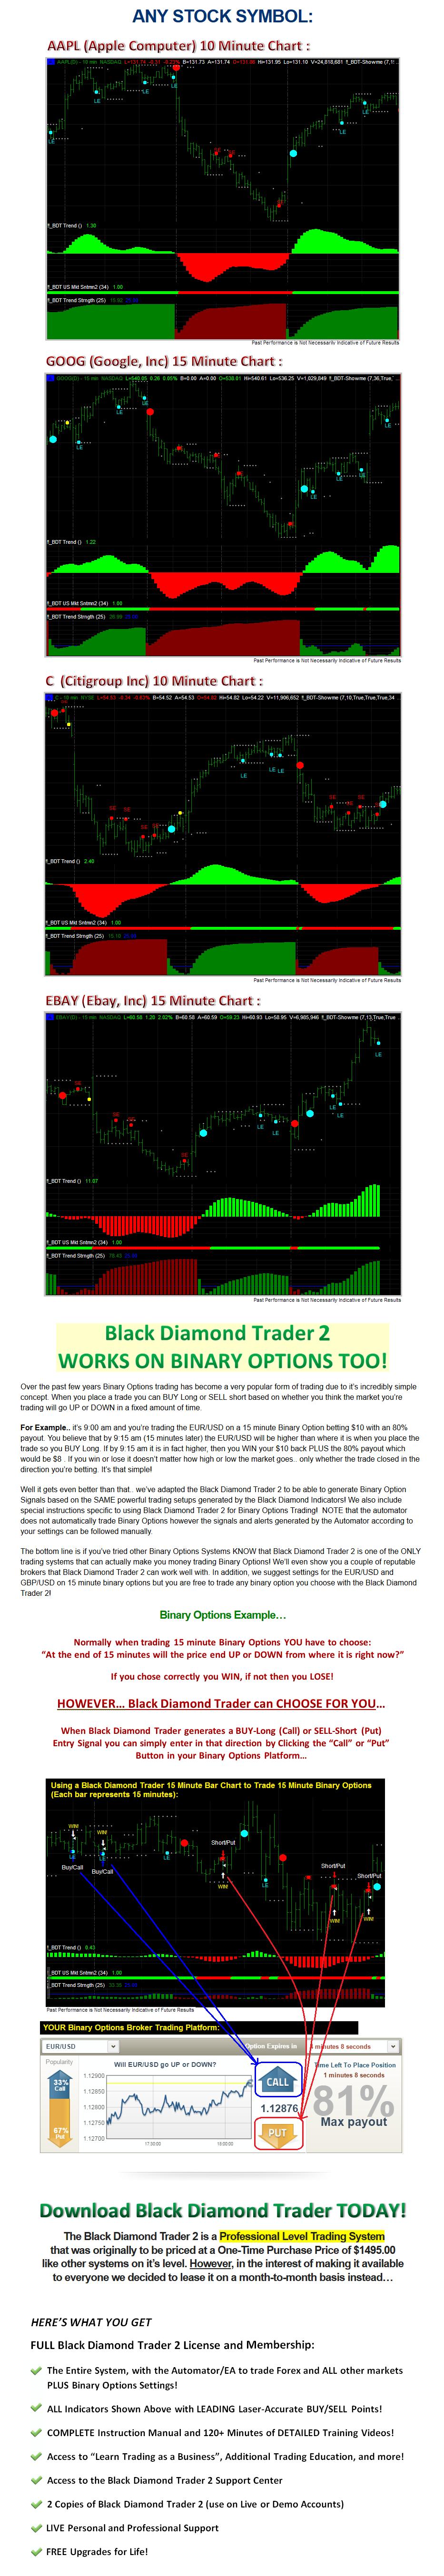 ForexGrail The Incredible New Trading System (Enjoy Free BONUS Black Diamond trader v2)